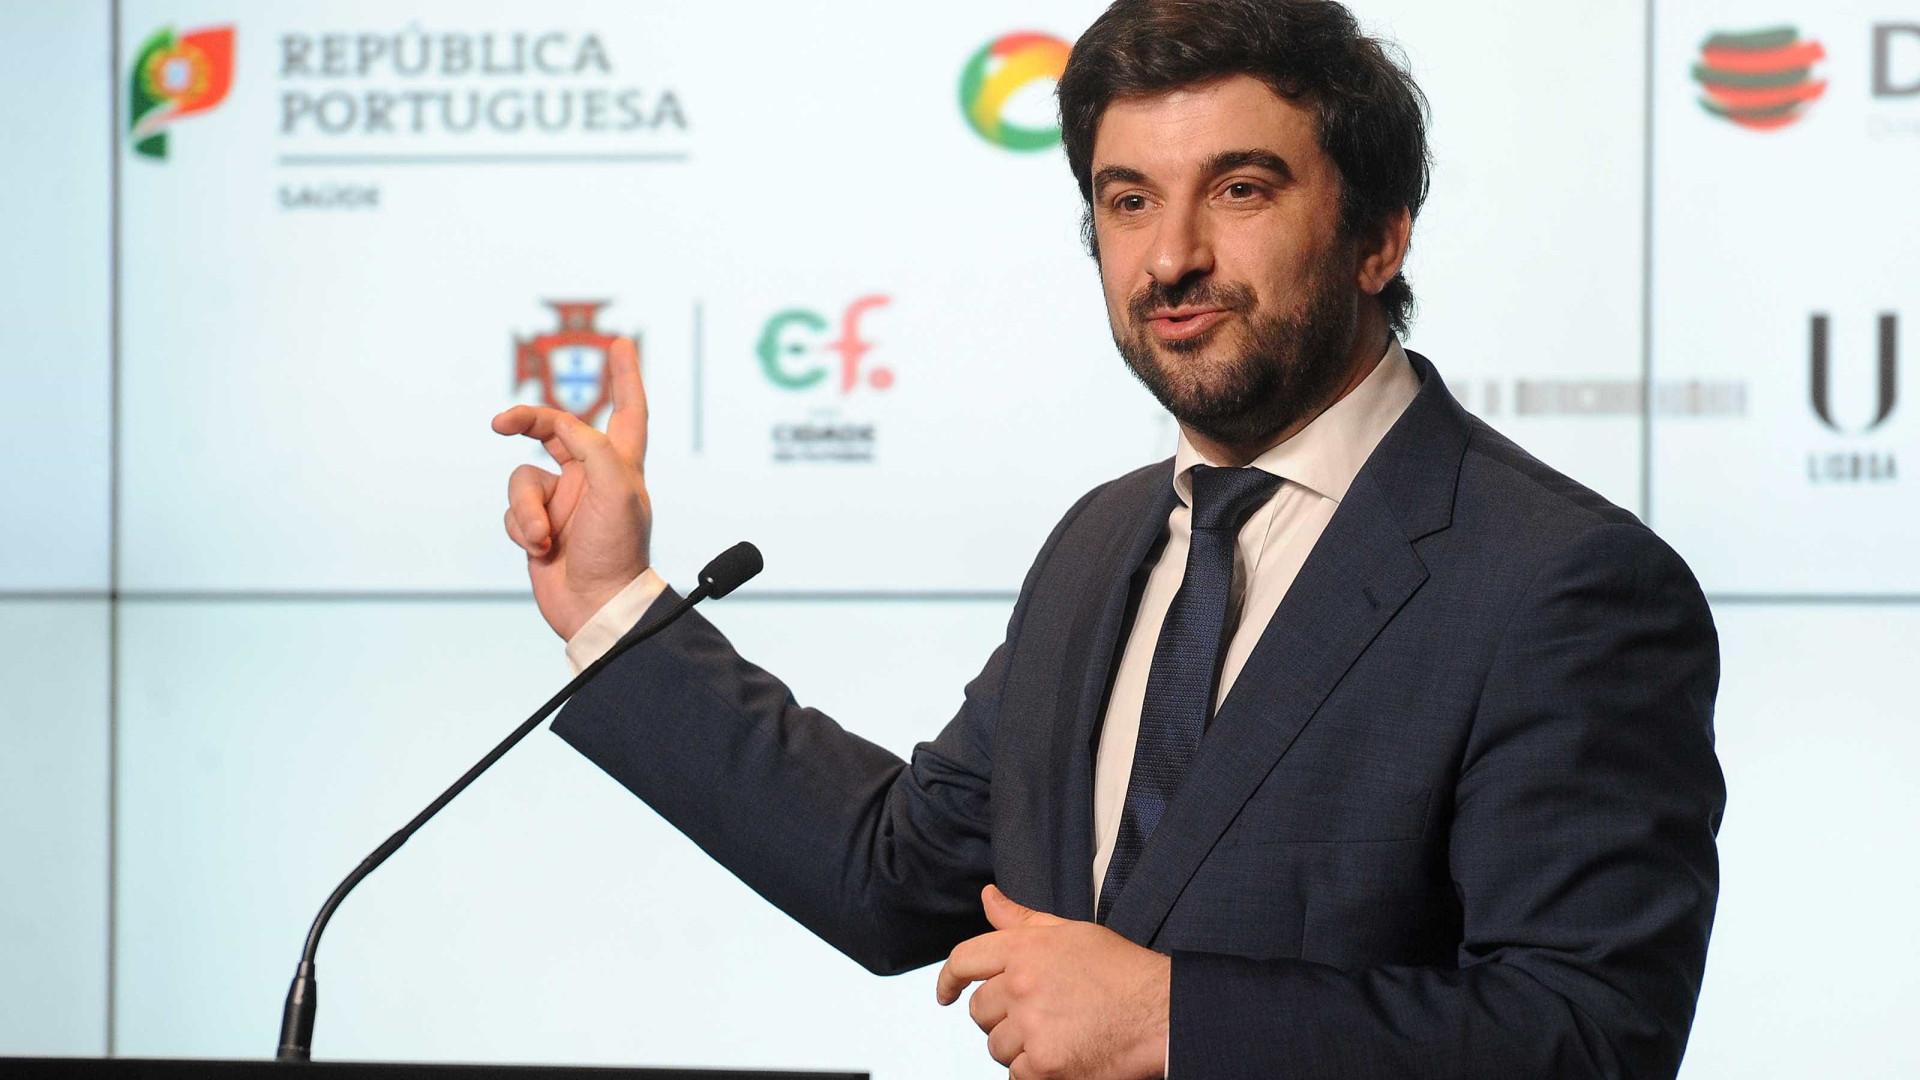 "Língua portuguesa é ""diferenciadora para quem a domina"""